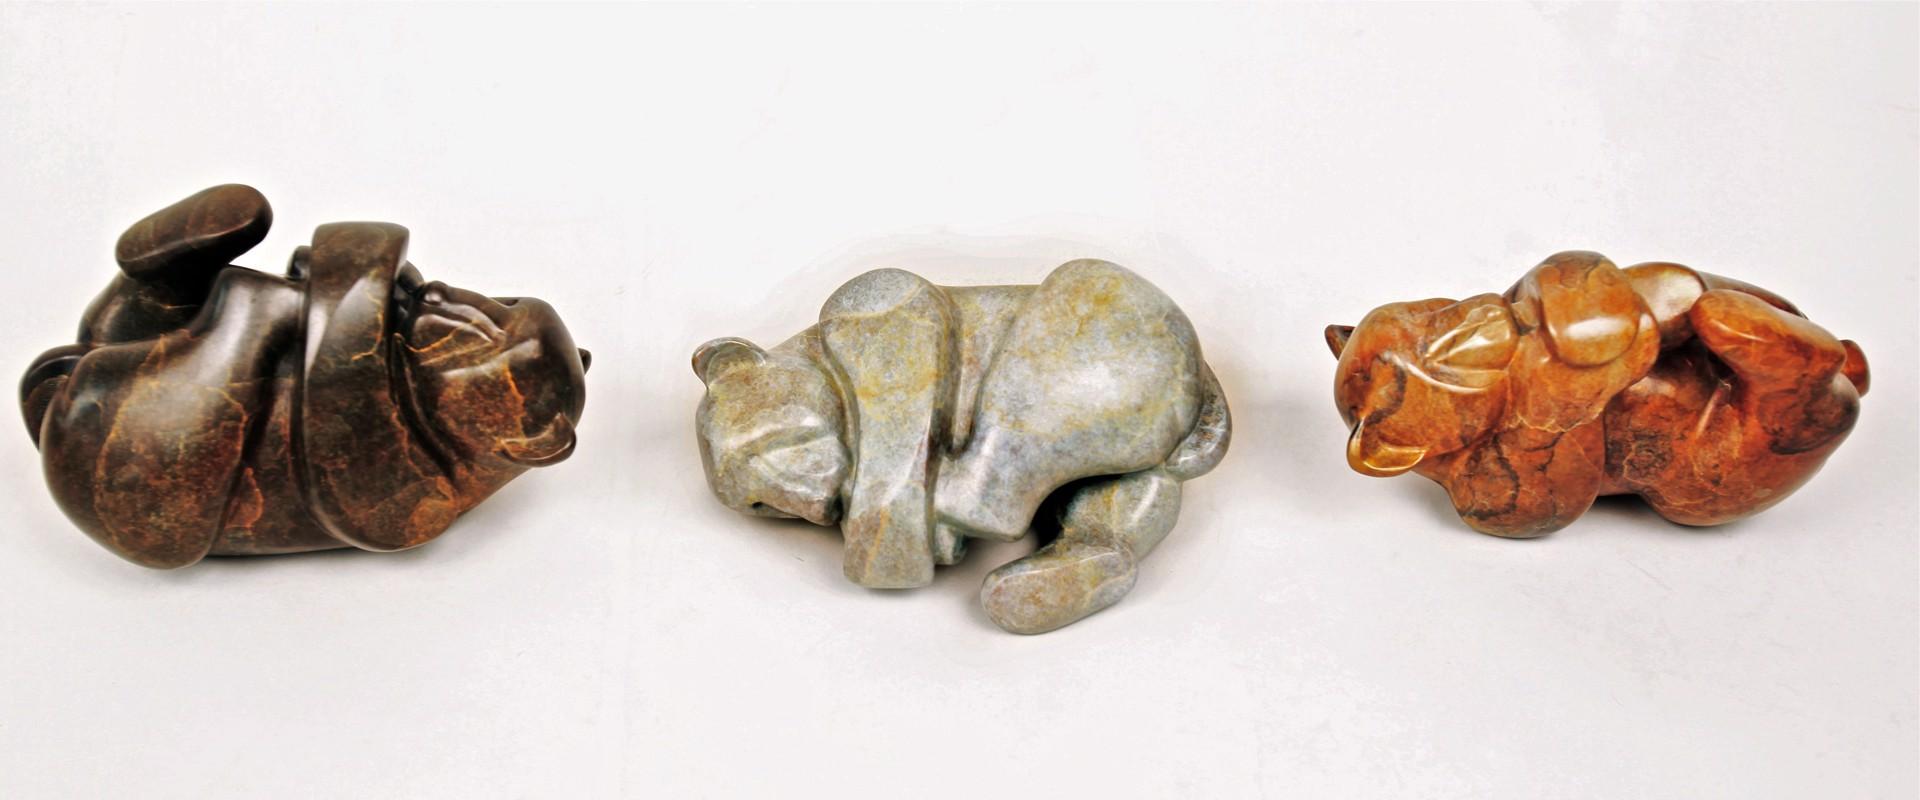 Little Worries I, II, III (each) by Mark Yale Harris